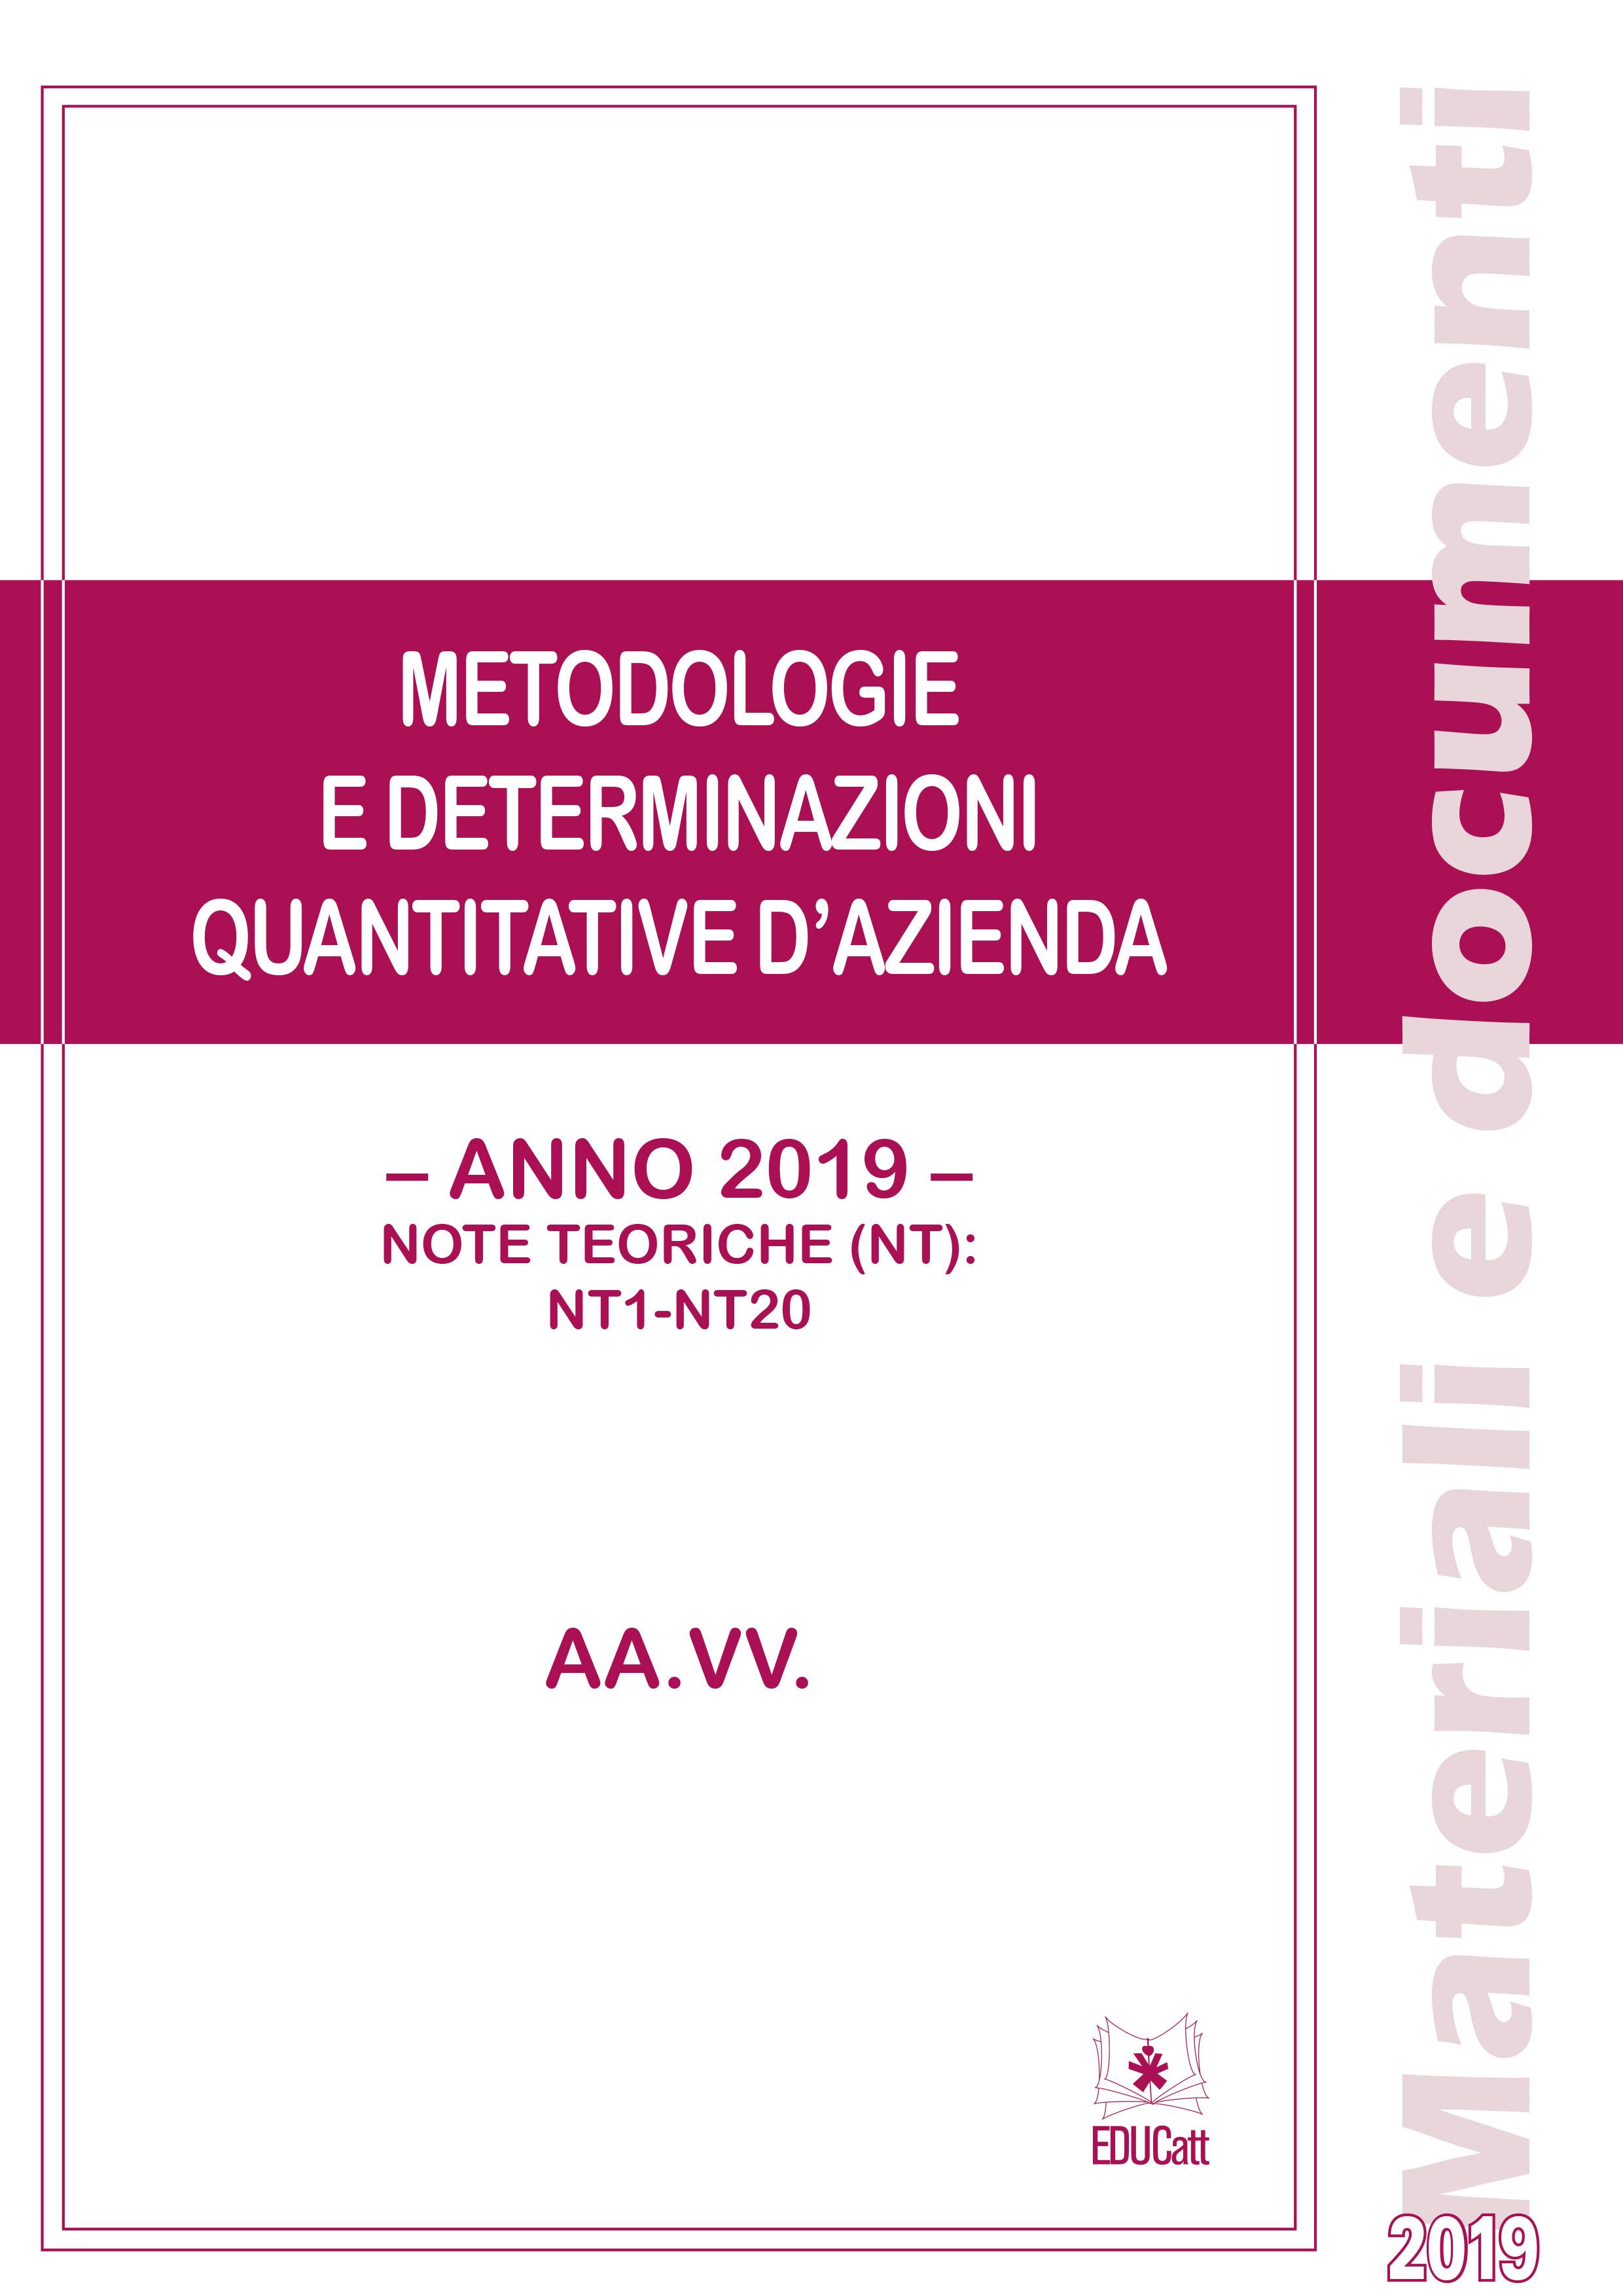 Metodologie e determinazioni quantitative d'azienda 2019